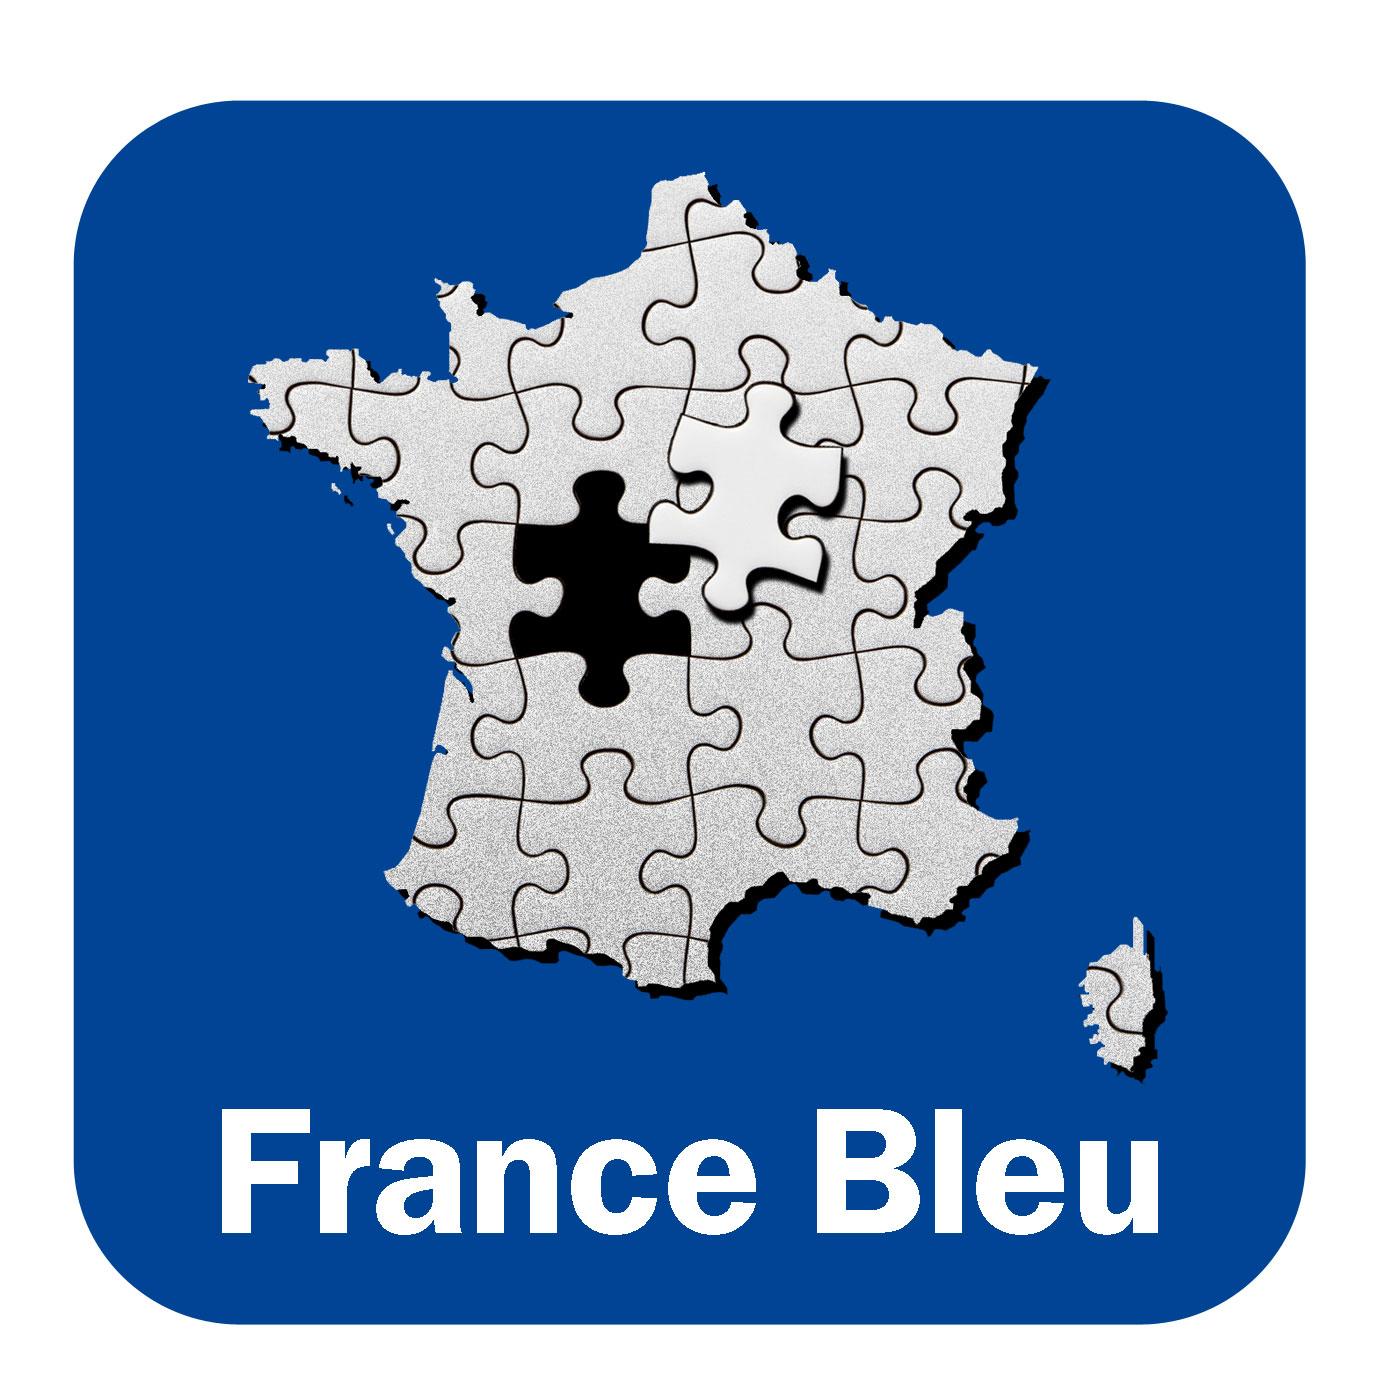 Landes au coeur France Bleu Gascogne